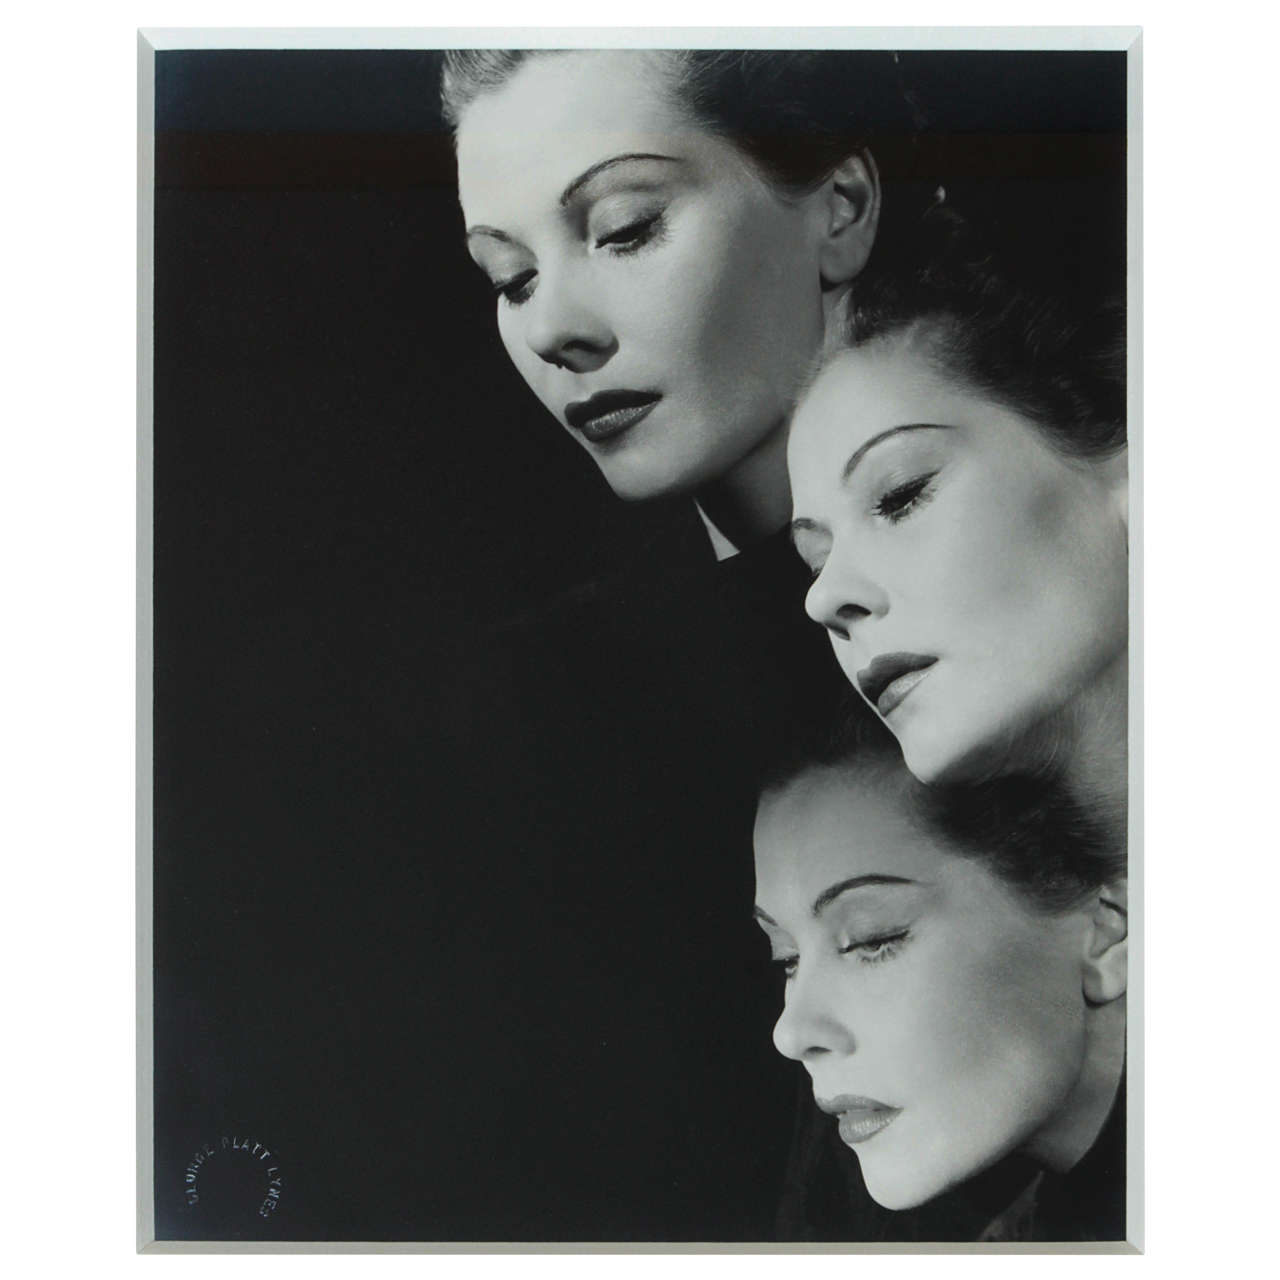 George Platt Lynes 1930s Photograph of Princess Natalie Paley For Sale